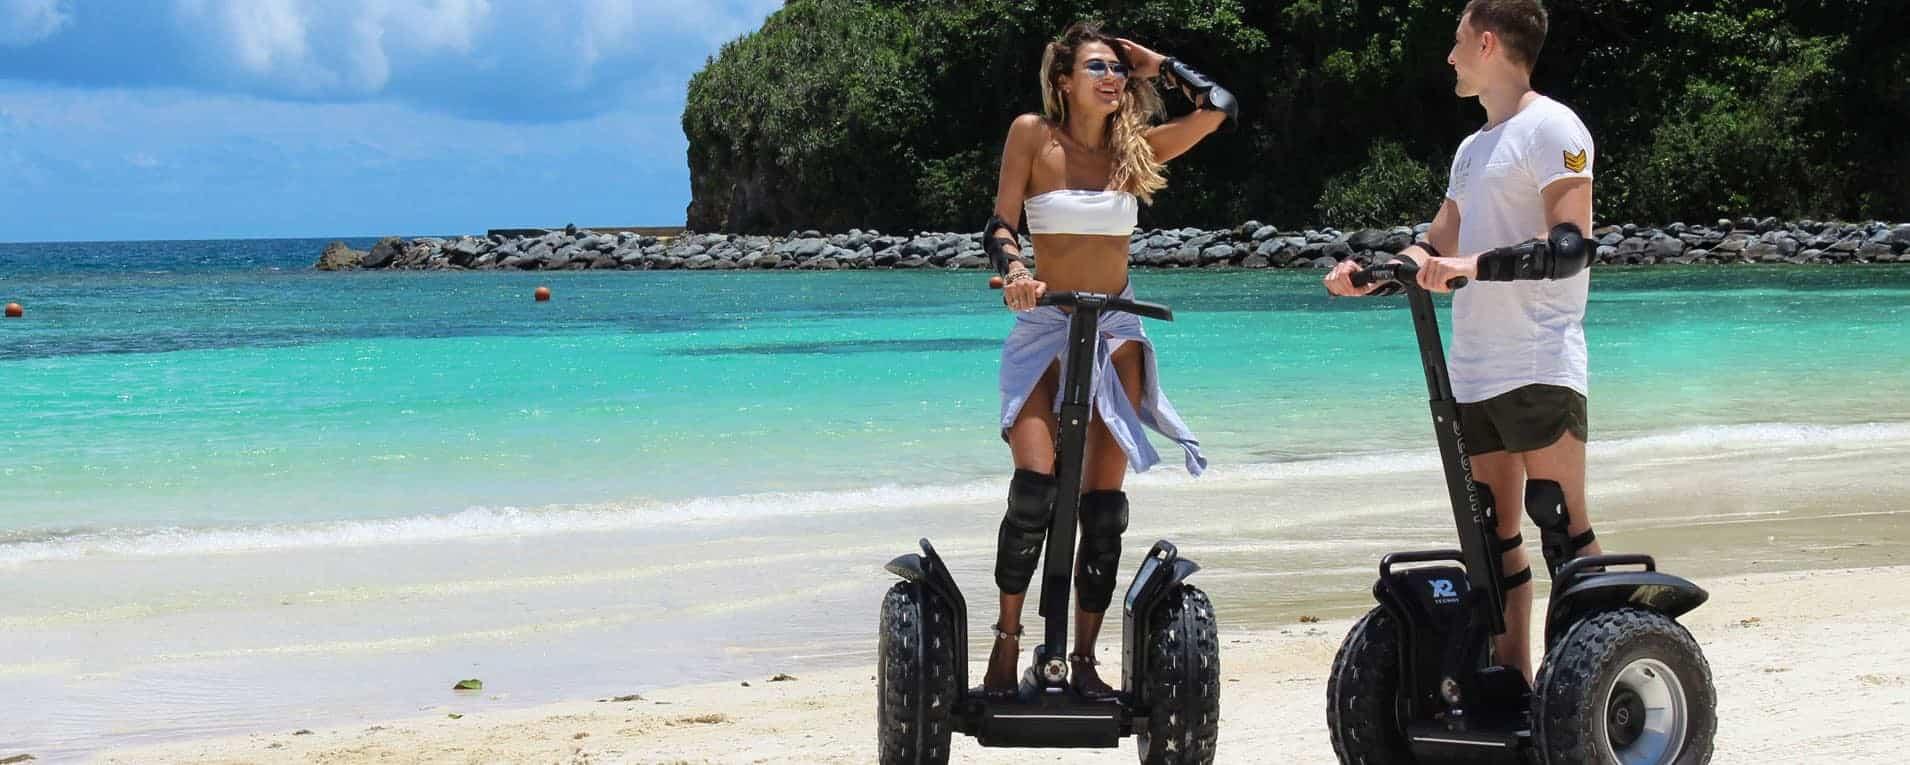 Fairways and Bluewater luxury resort, Boracay, Philippines